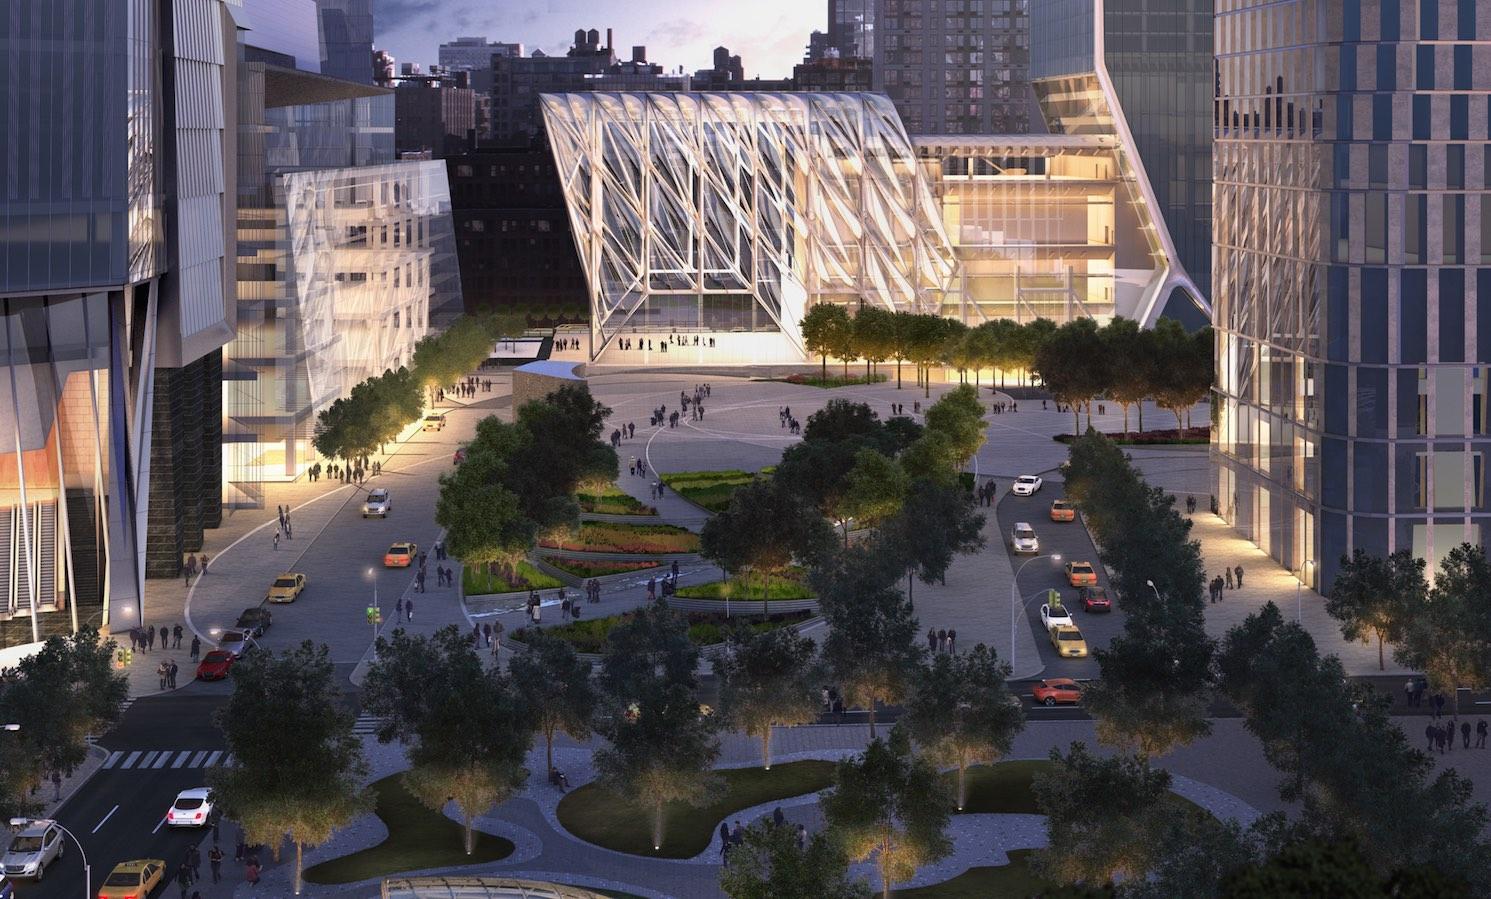 The Arts Arena | Municipal Art Society, Paris-New York Series on Cities